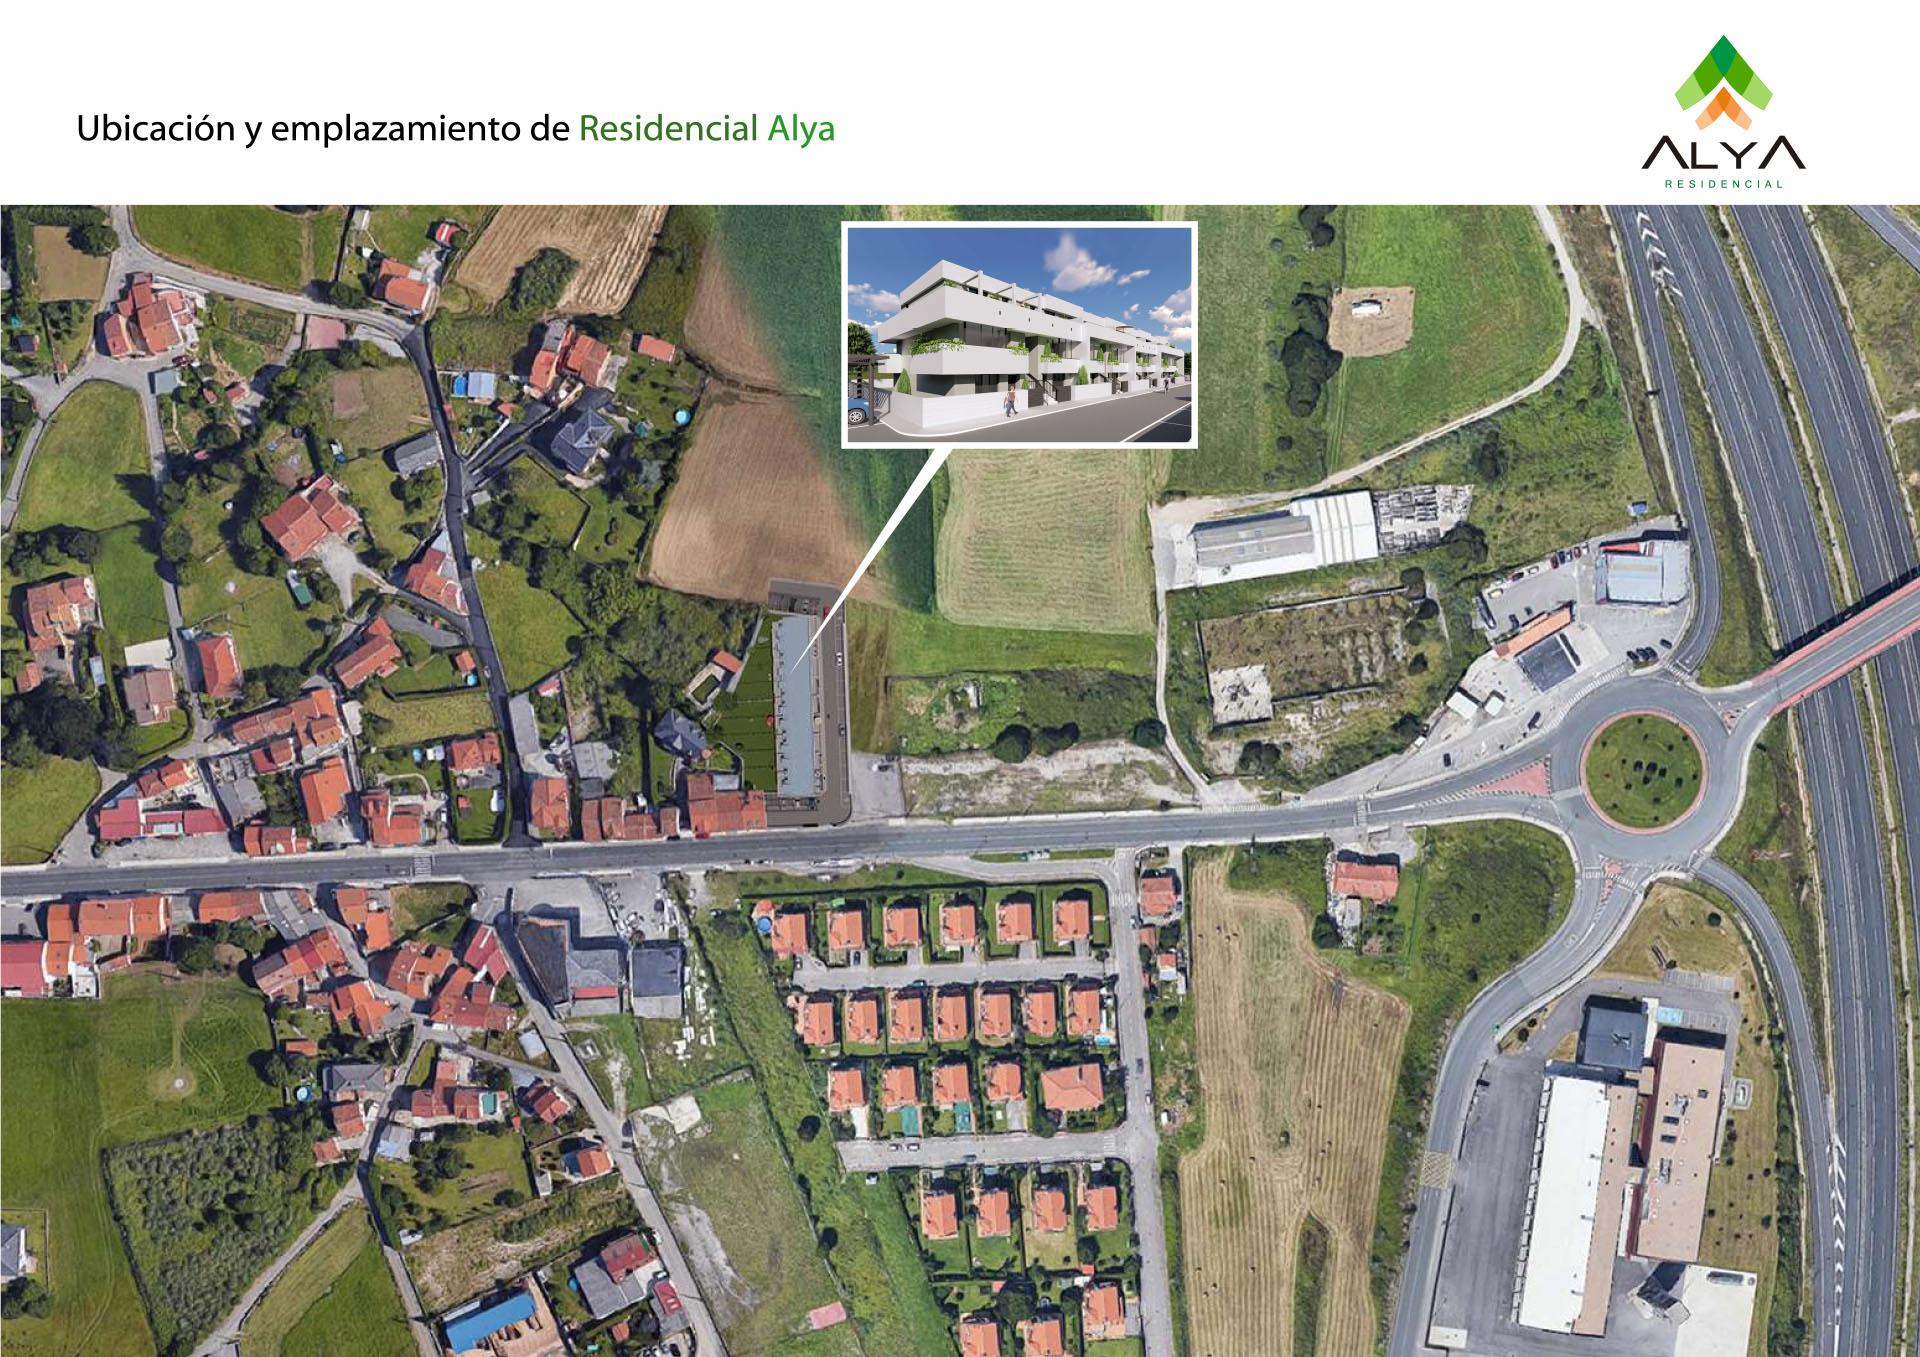 Residencial_Alya-Ubicacion_02